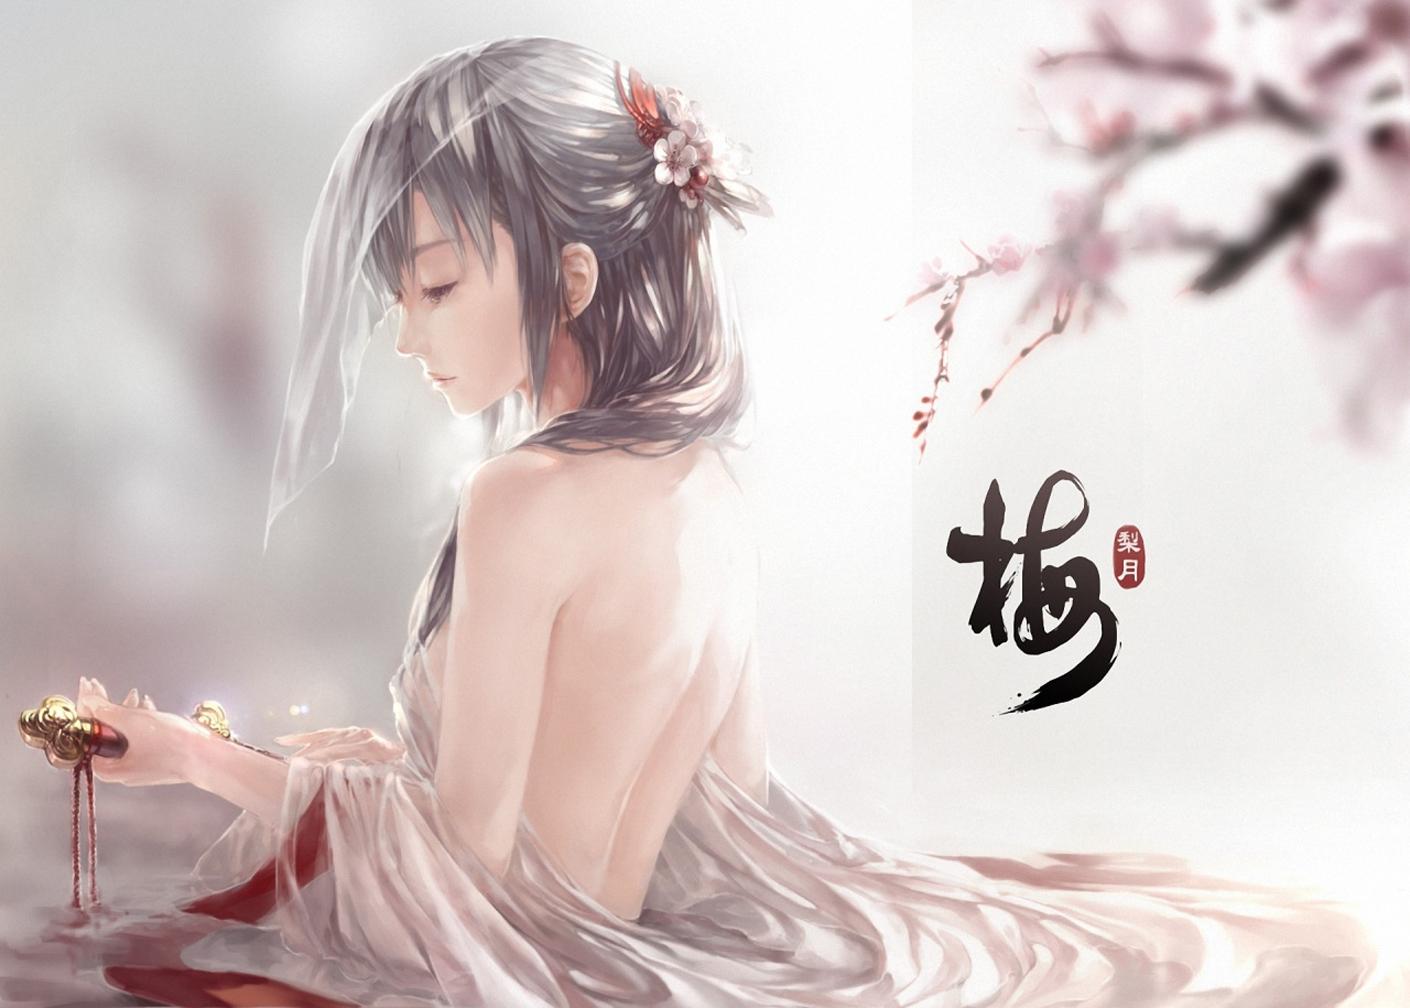 Beautiful Girl Sad Face Cherry Blossom Anime HD Wallpaper Desktop PC 1410x1008